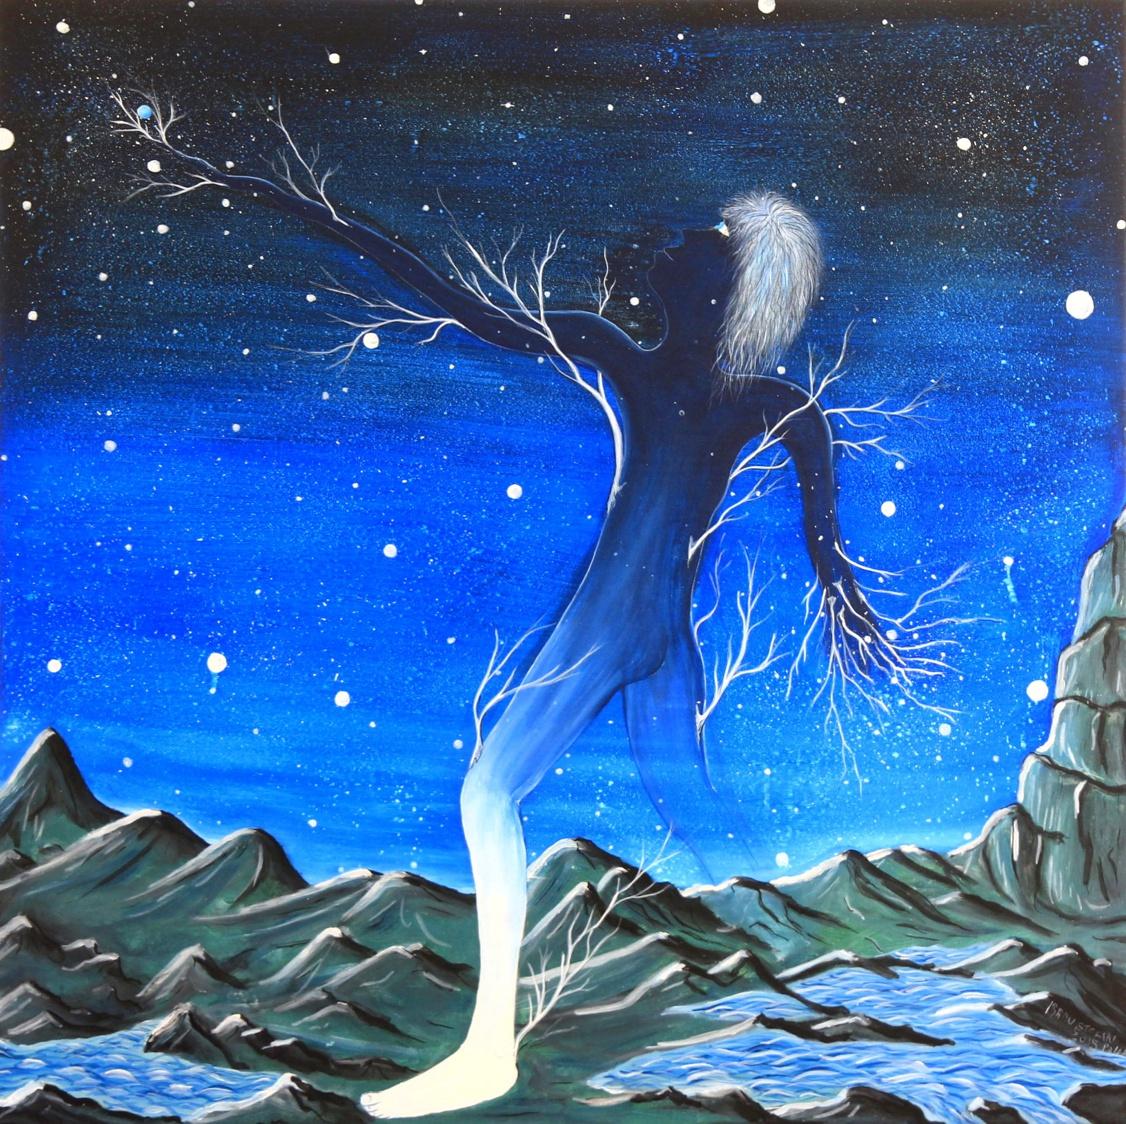 -L'âme de la galaxie-The soul of the Galaxy- peinture acrylique-Radu Stefan Poleac-artist's studioJ